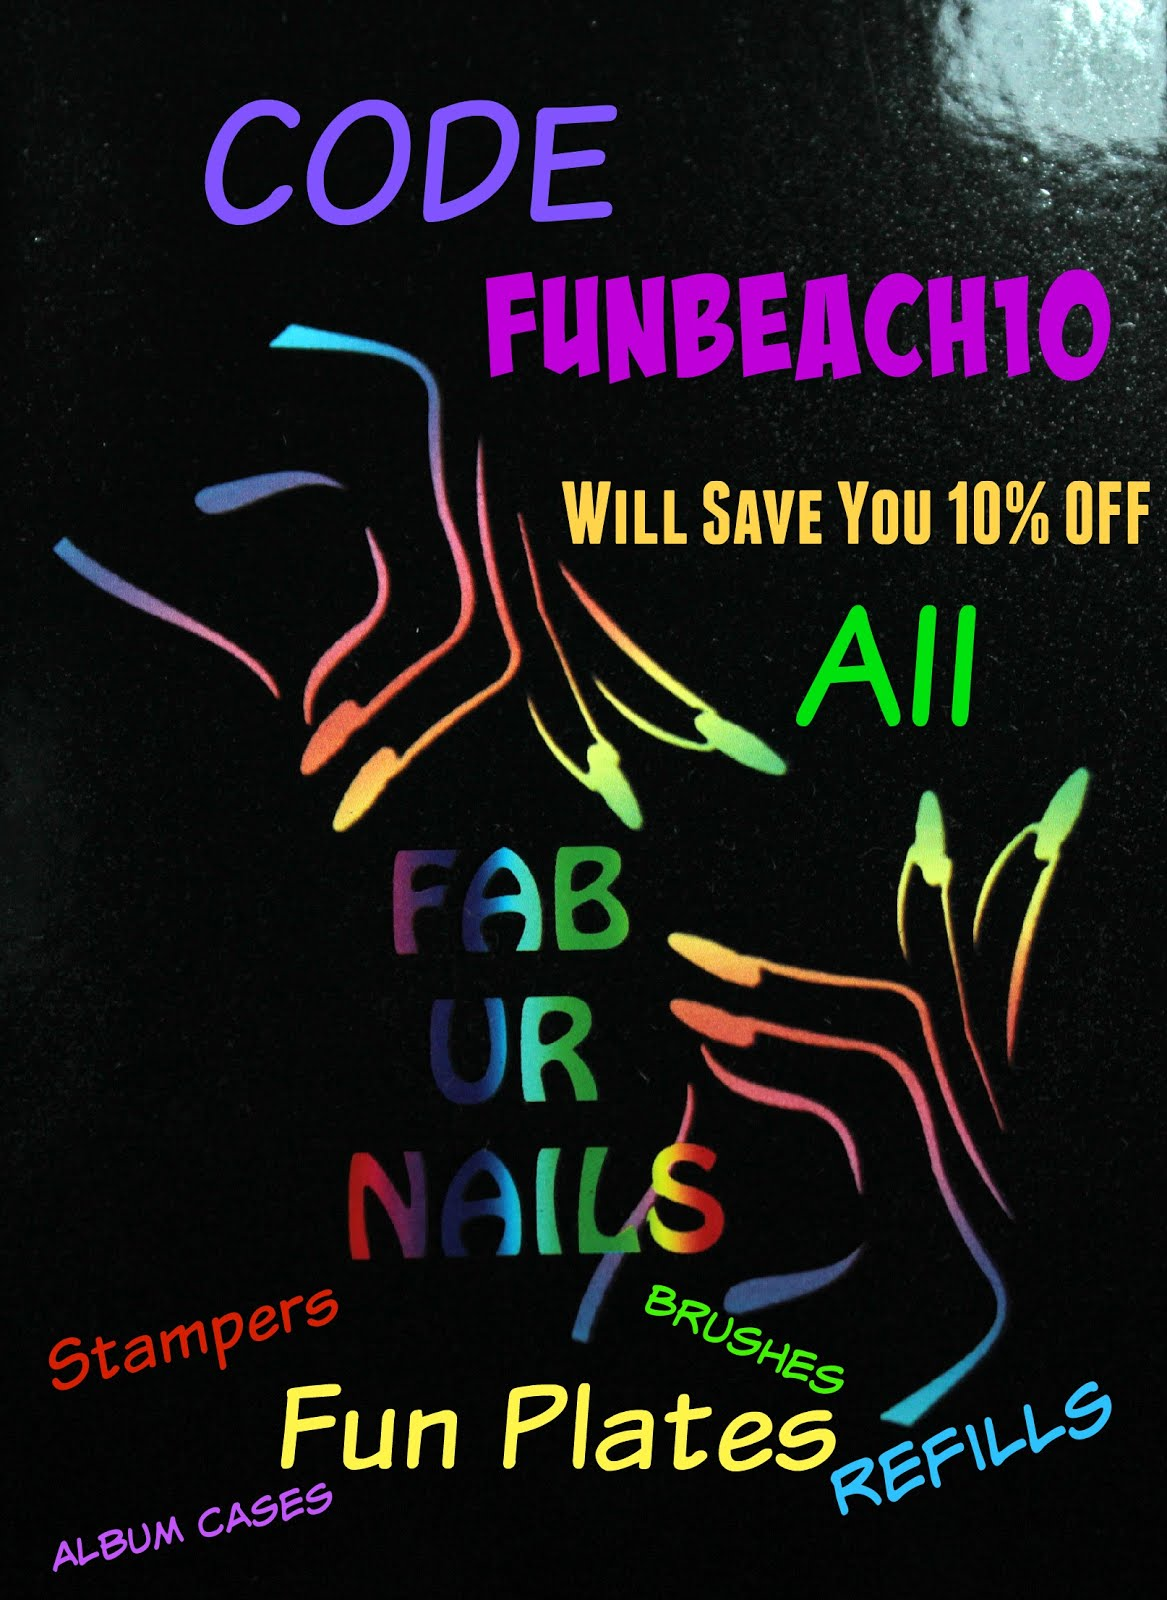 FUNBEACH10